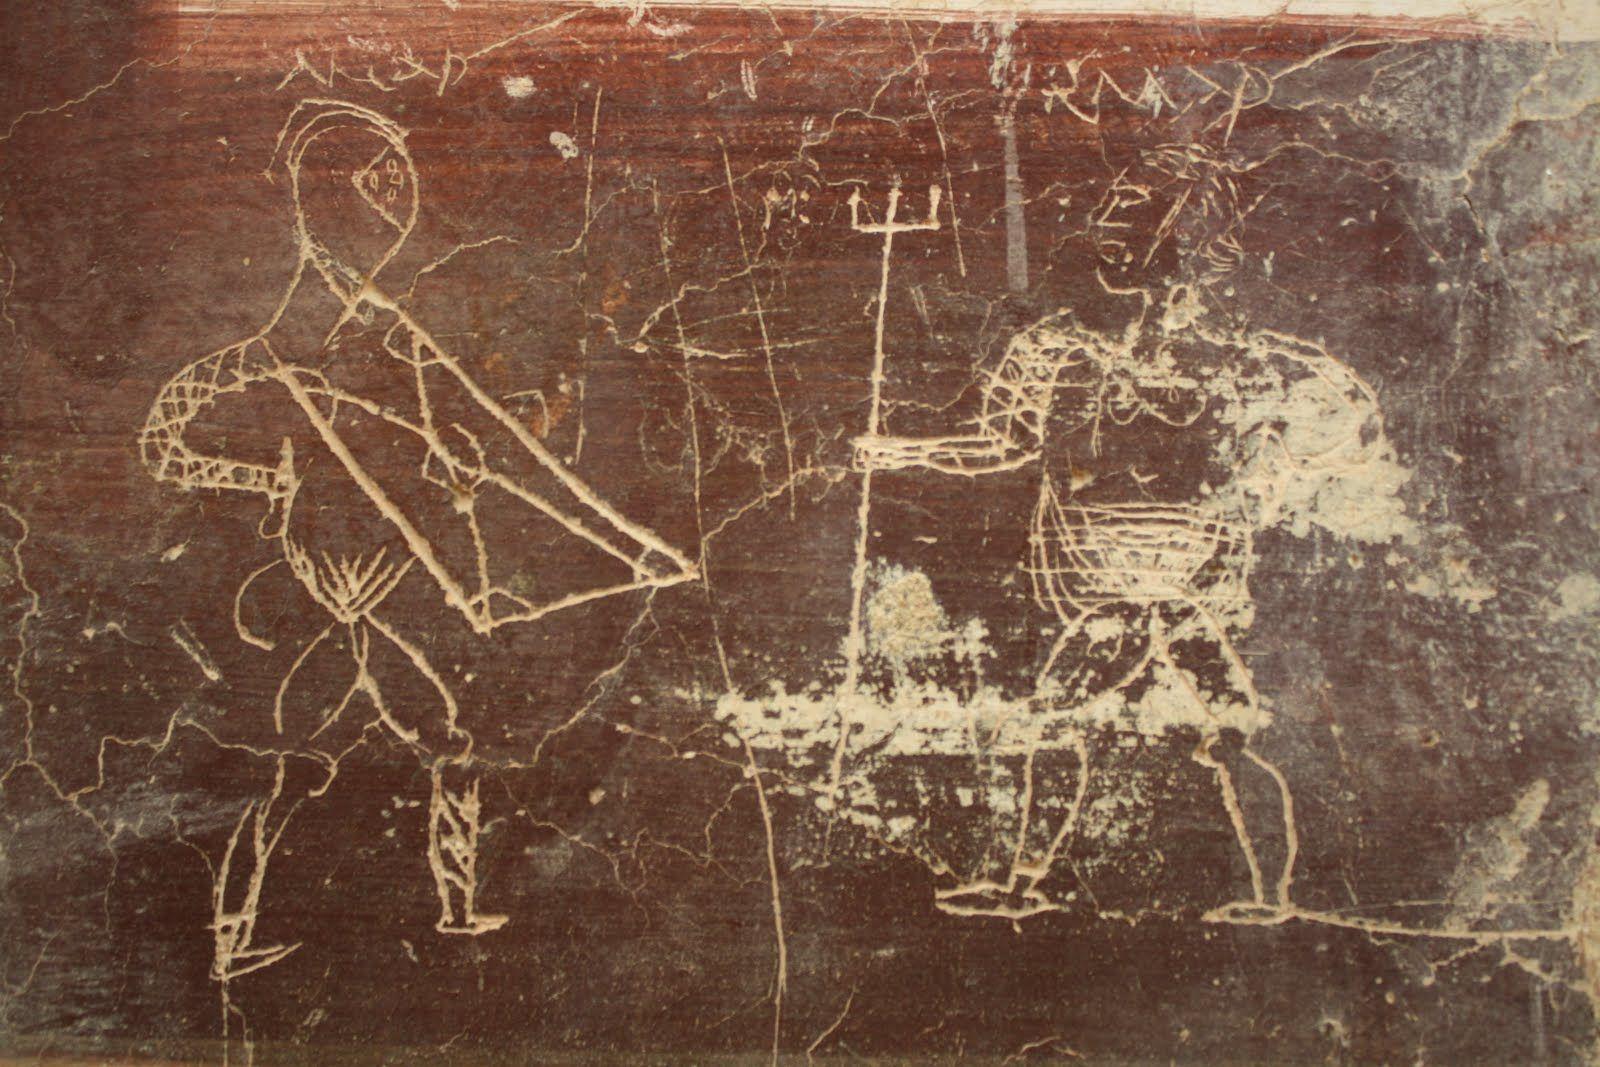 Graffiti on walls google search graffiti history graffiti art roman gladiators roma